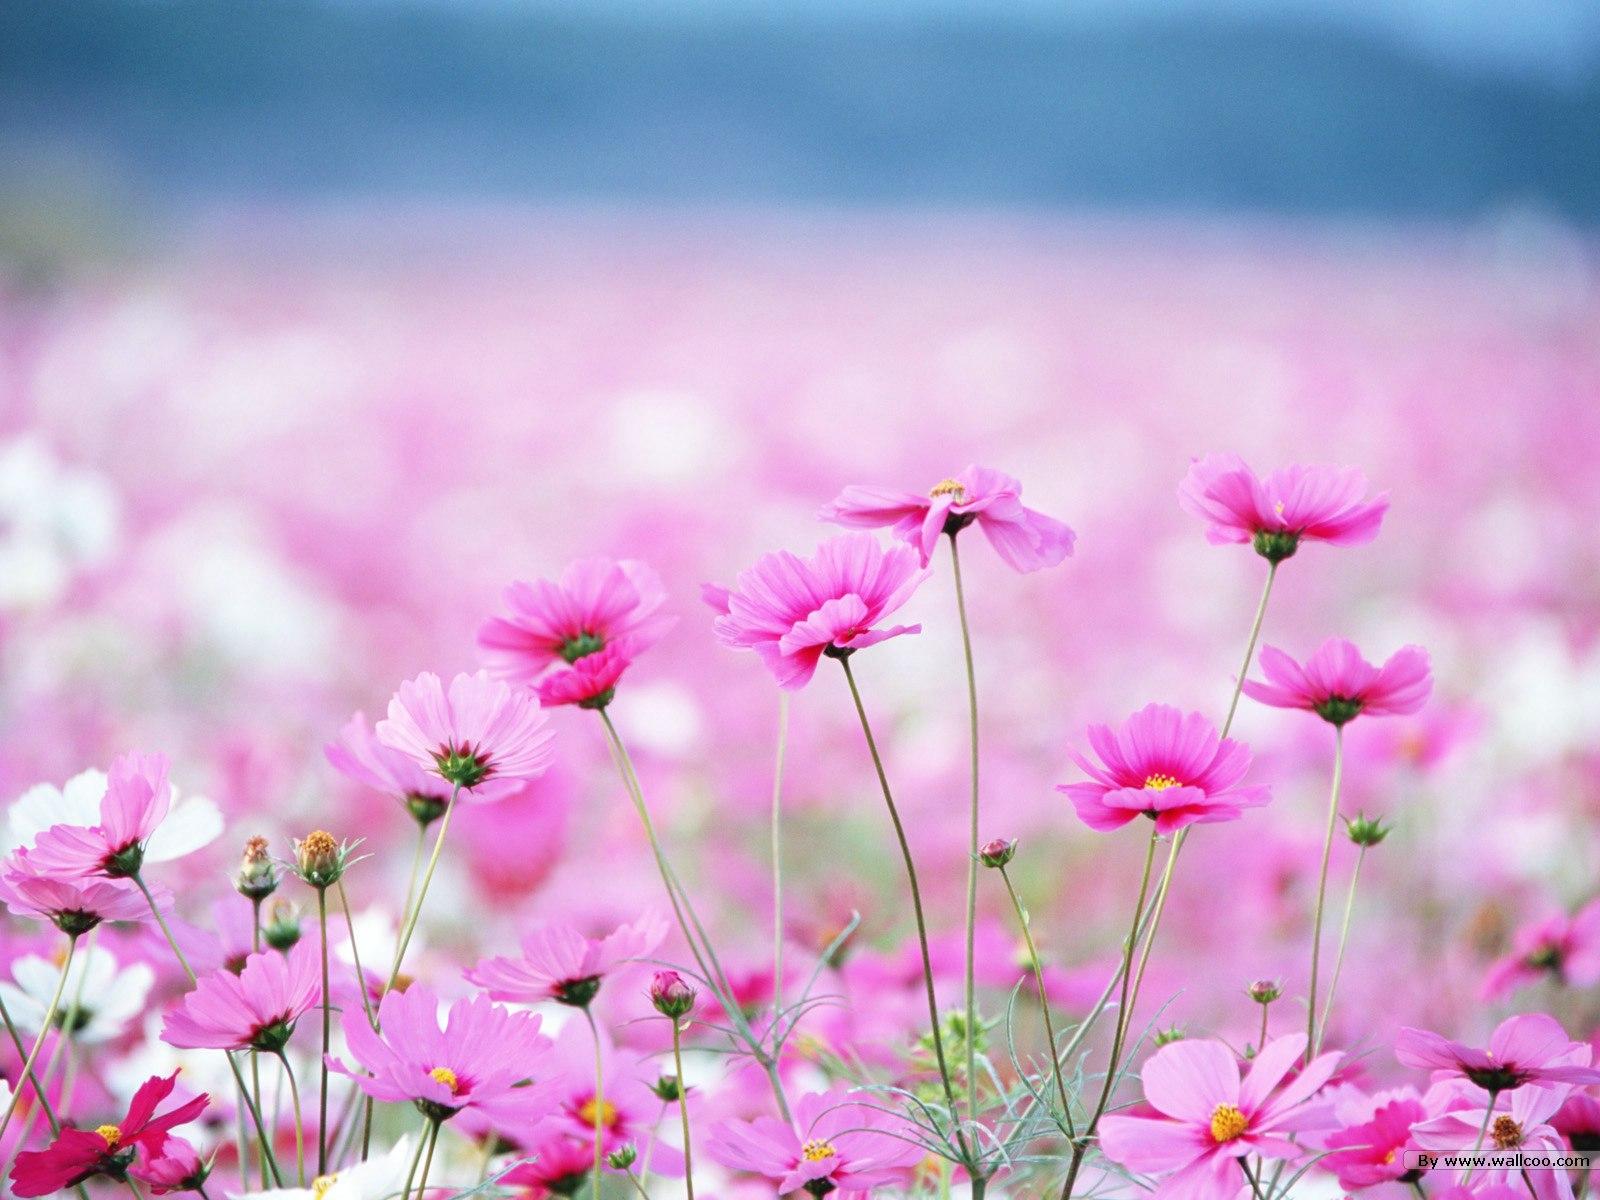 Fondos De Pantalla De Flores Hermosas Gratis